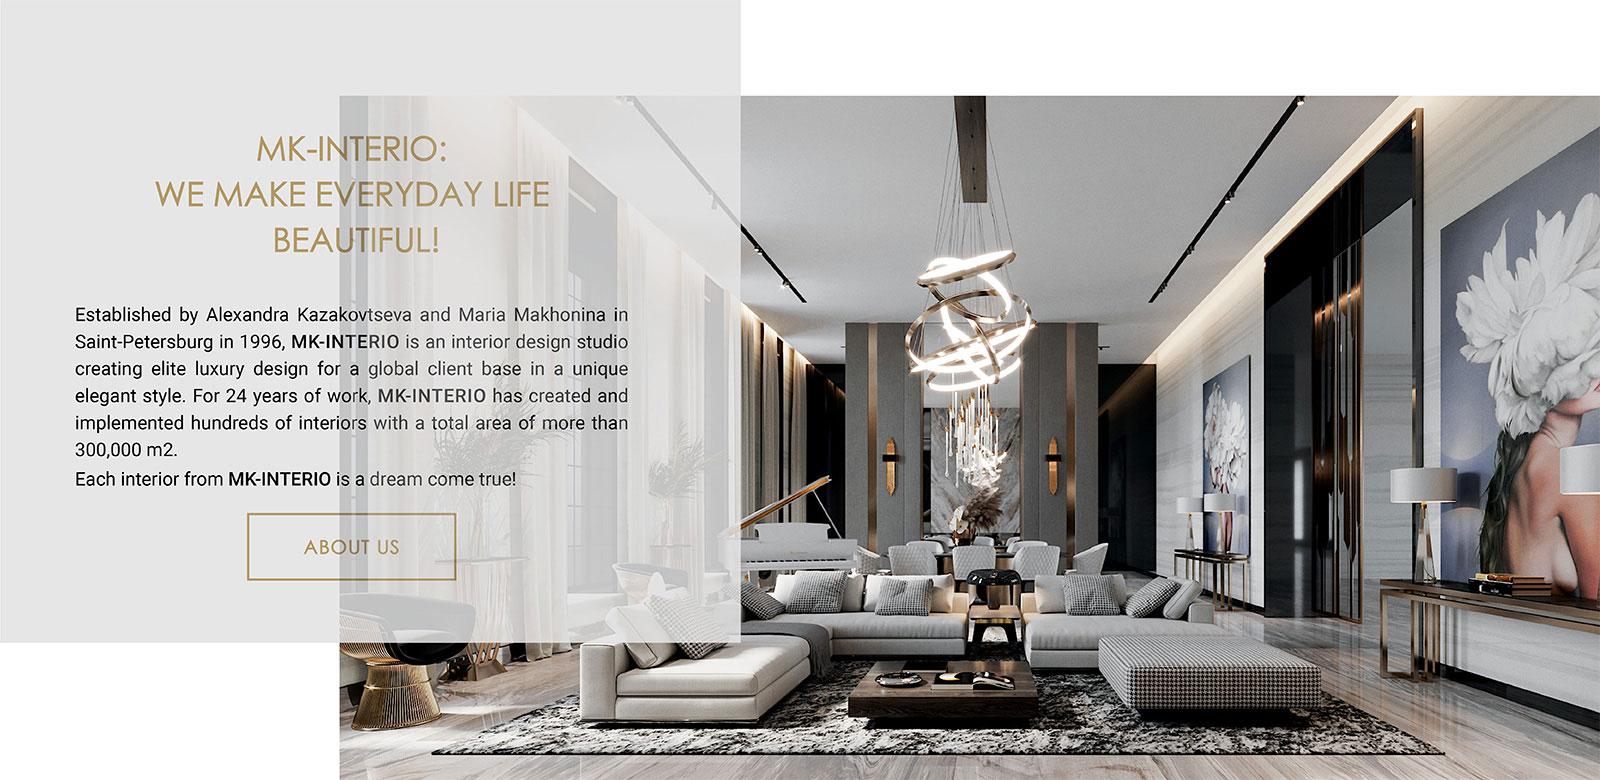 MK-INTERIO: We make everyday life beautiful!